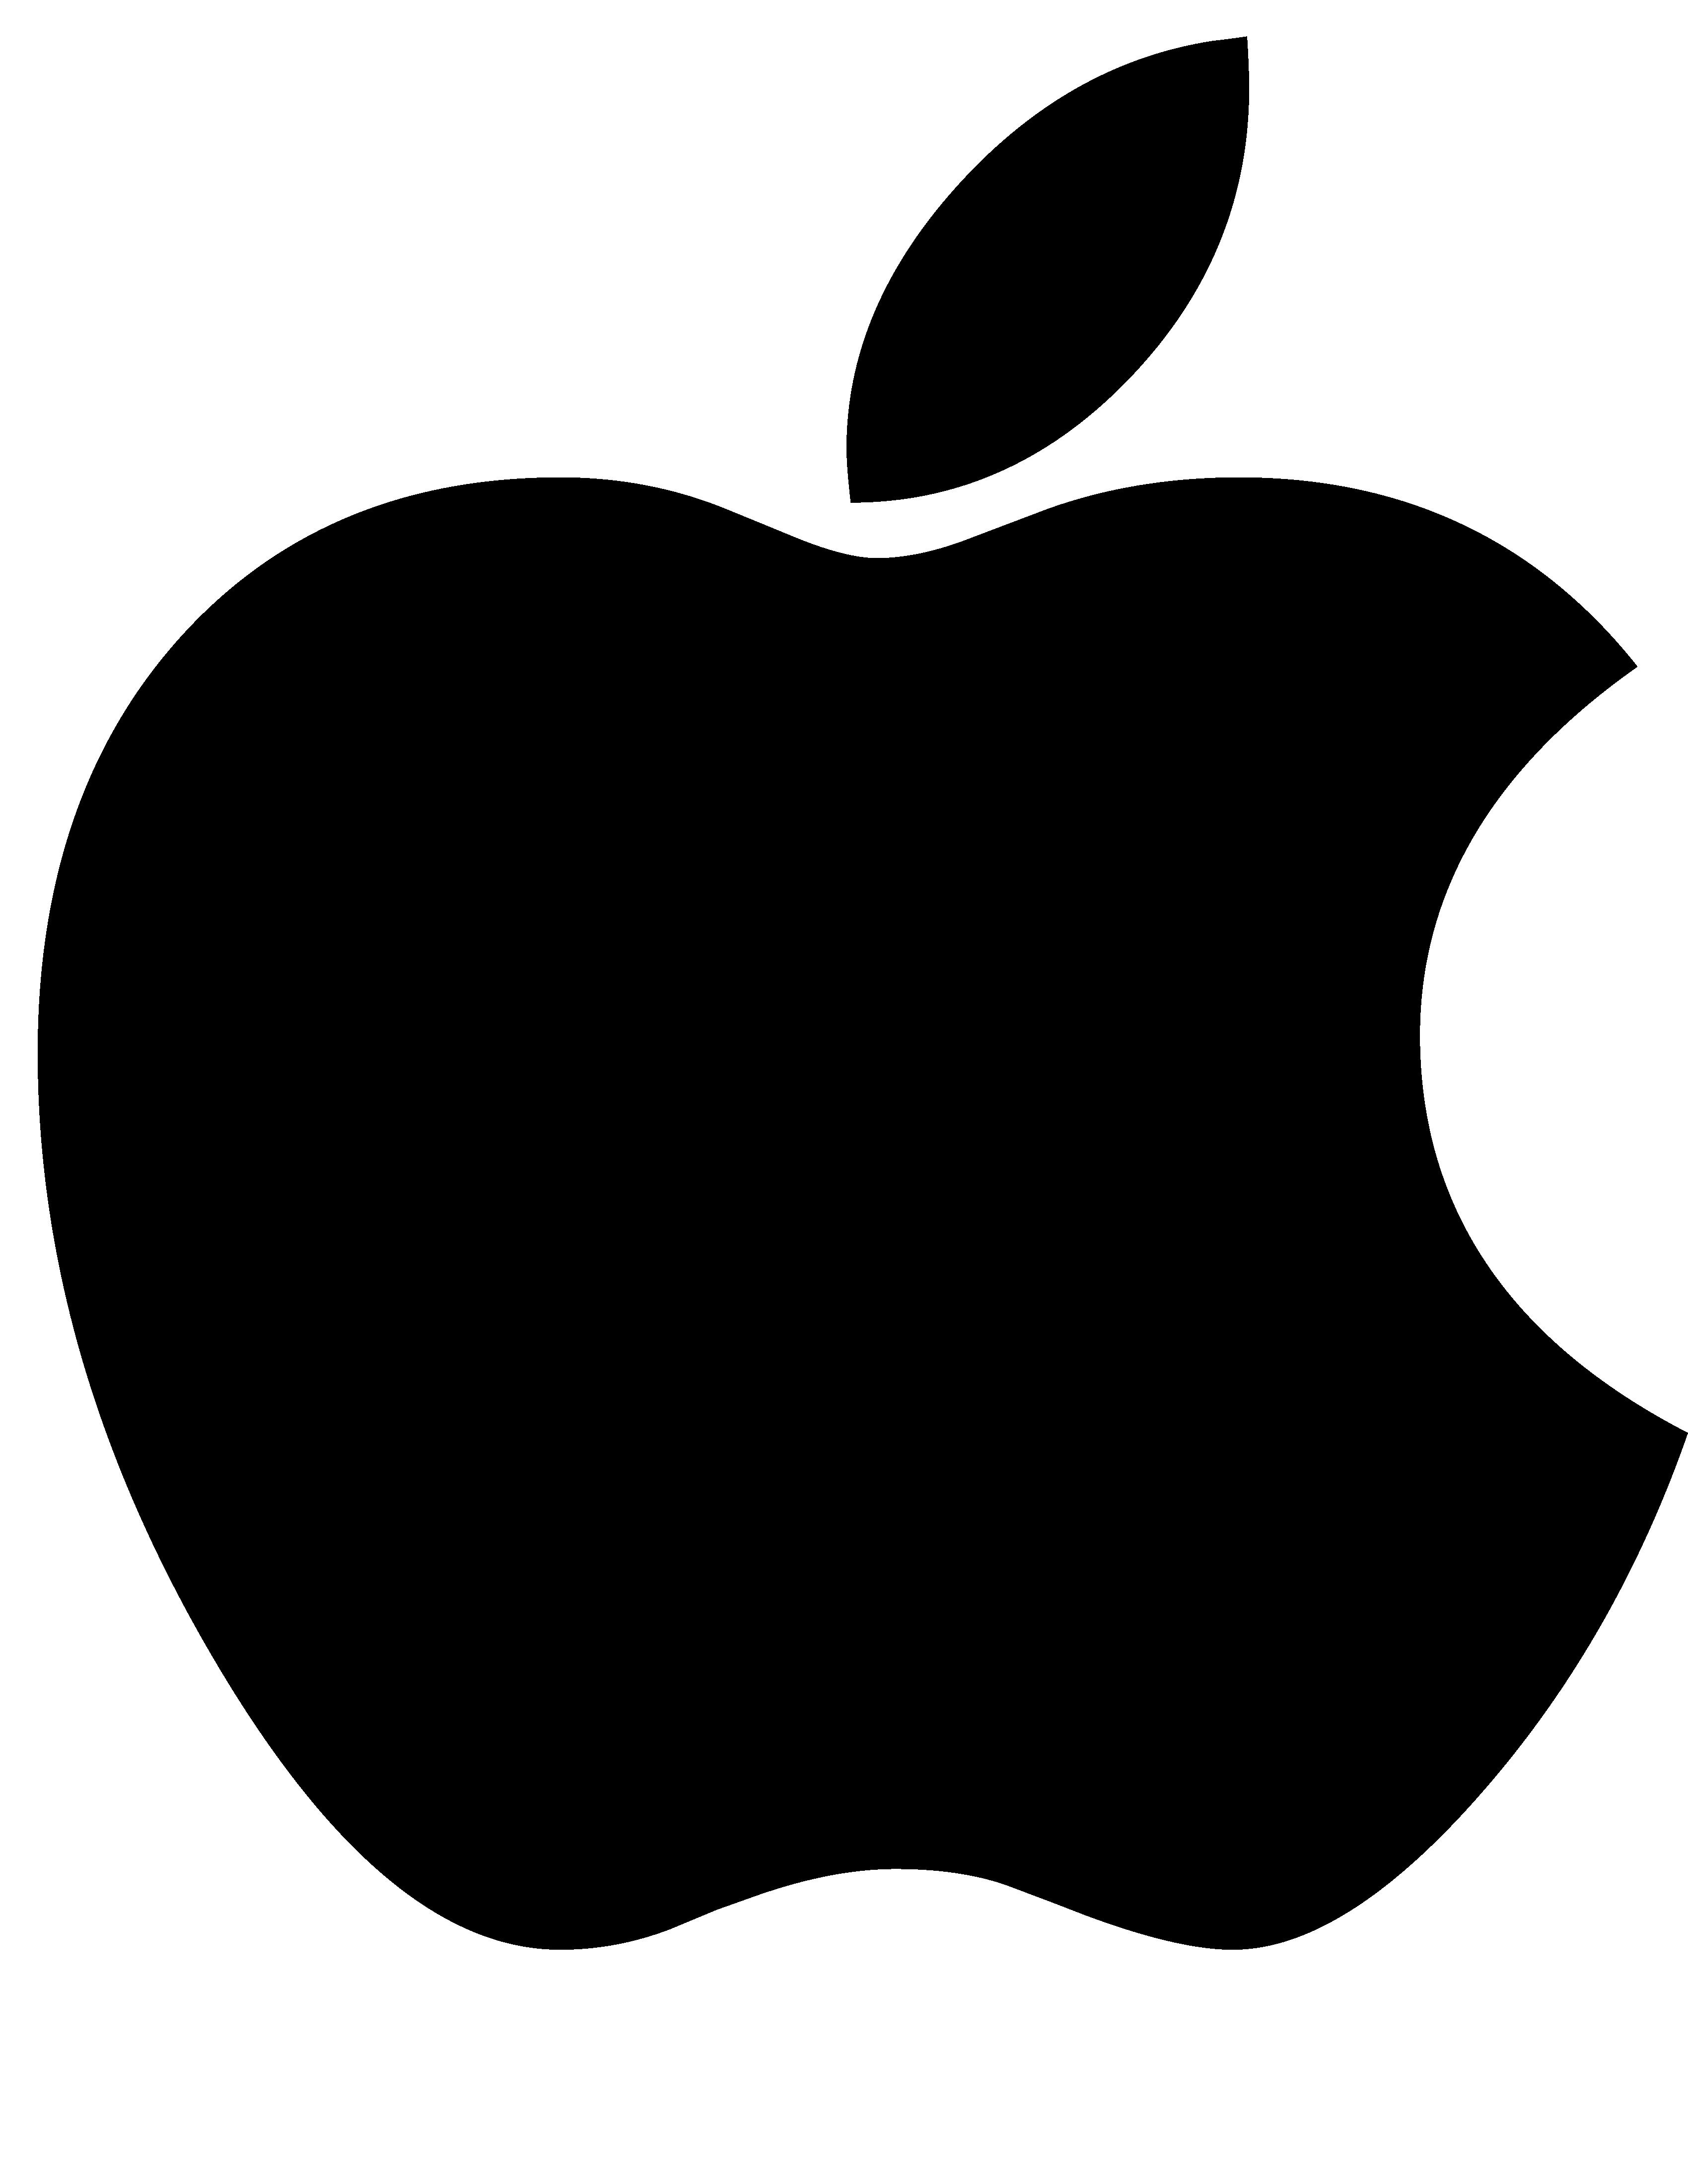 Apple Inc. clipart apple logo #4